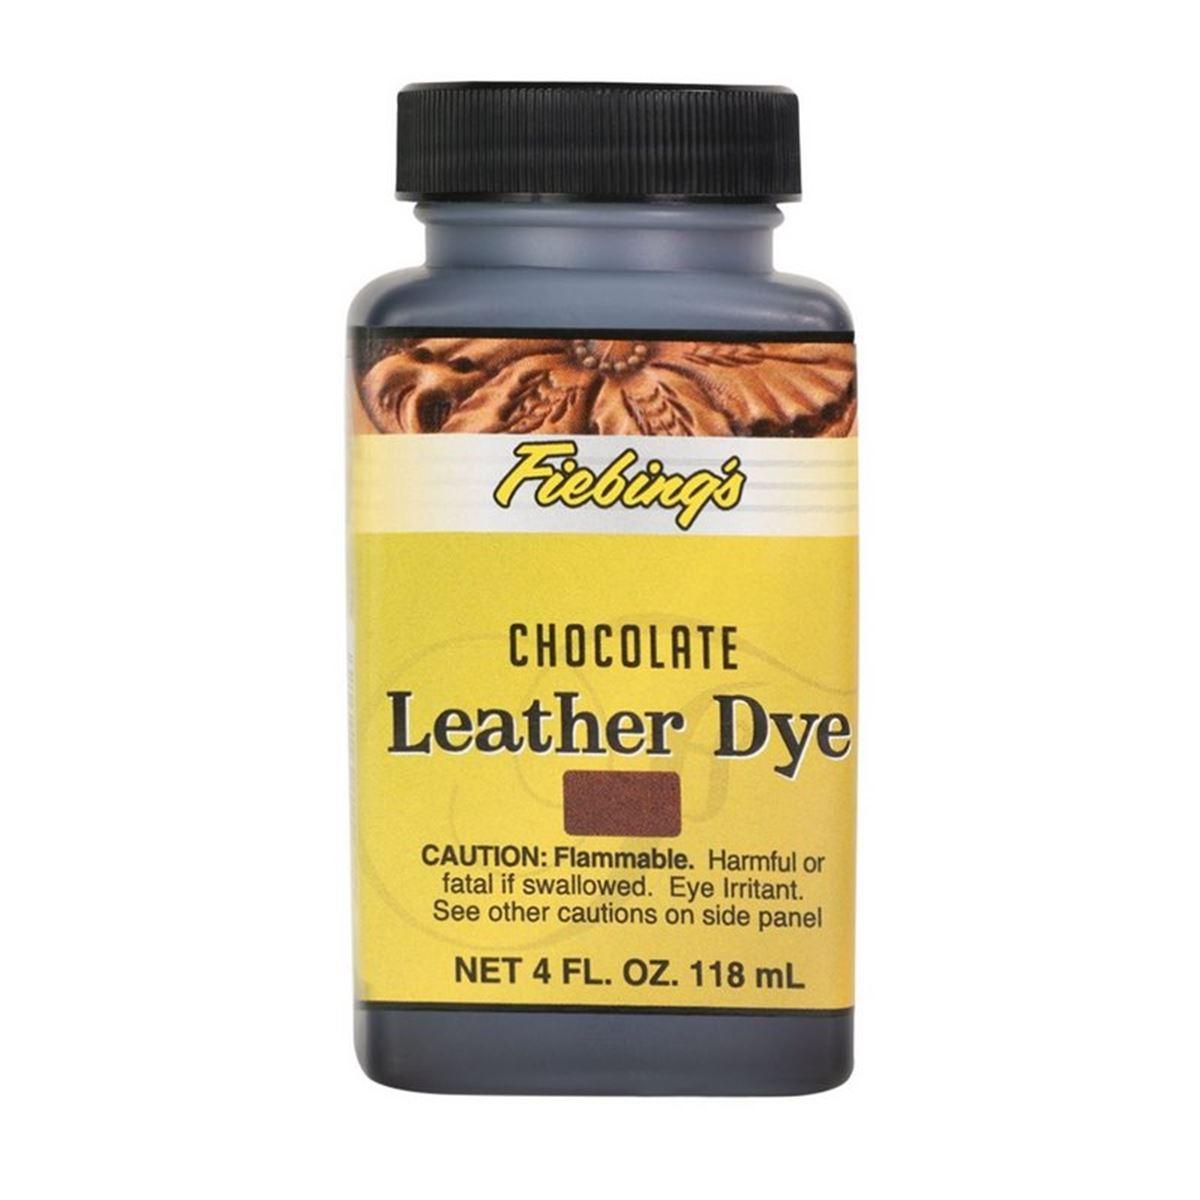 Teinture pour cuir FIEBING'S Leather dye - CHOCOLAT - CHOCOLATE